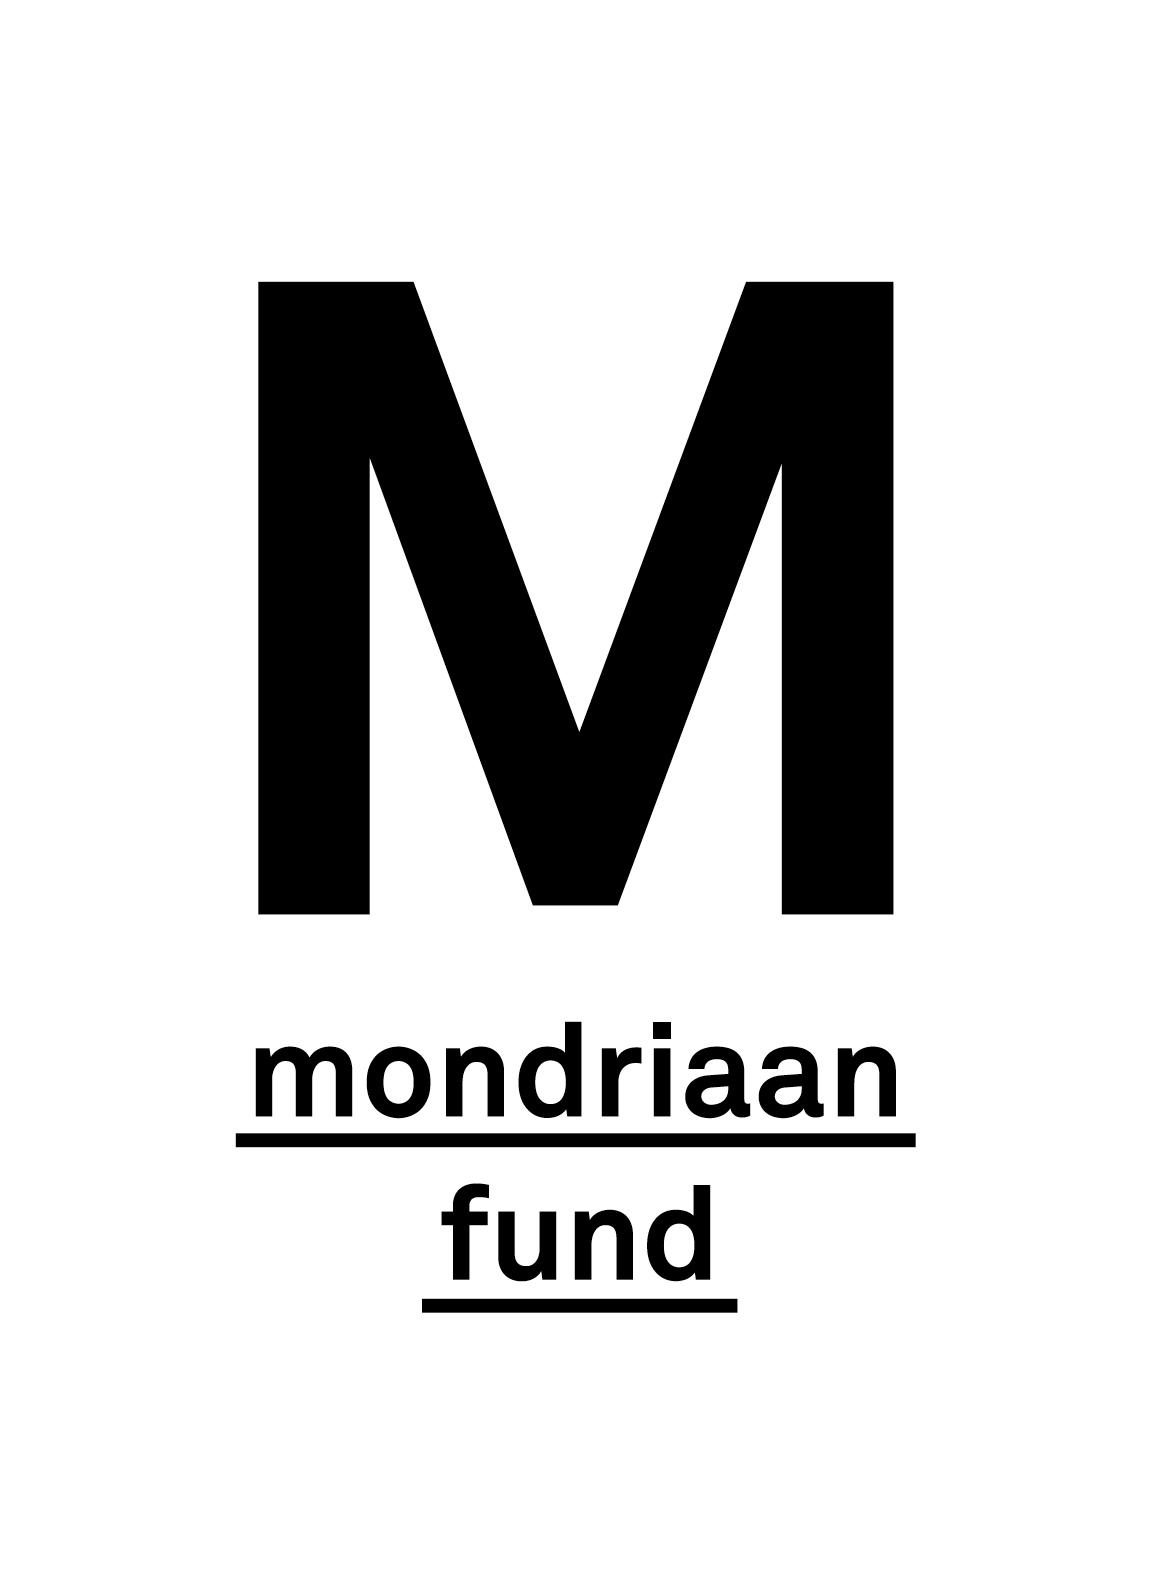 Mondriaan